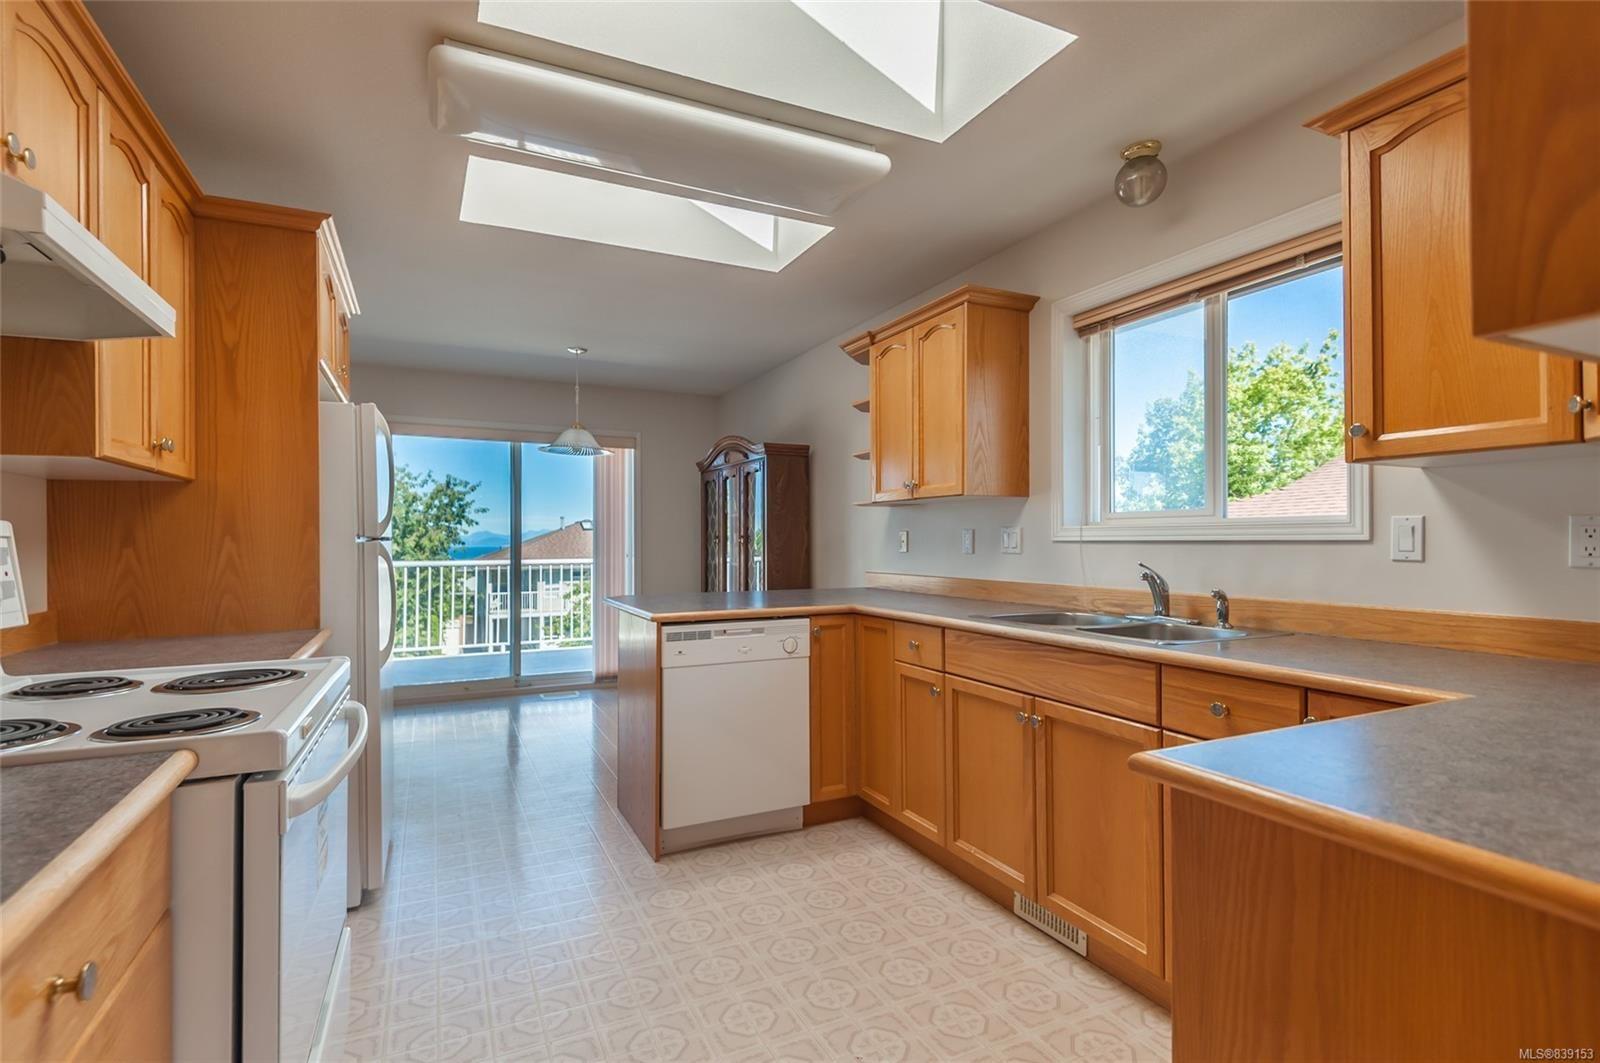 Photo 8: Photos: 6412 Dover Rd in NANAIMO: Na North Nanaimo House for sale (Nanaimo)  : MLS®# 839153